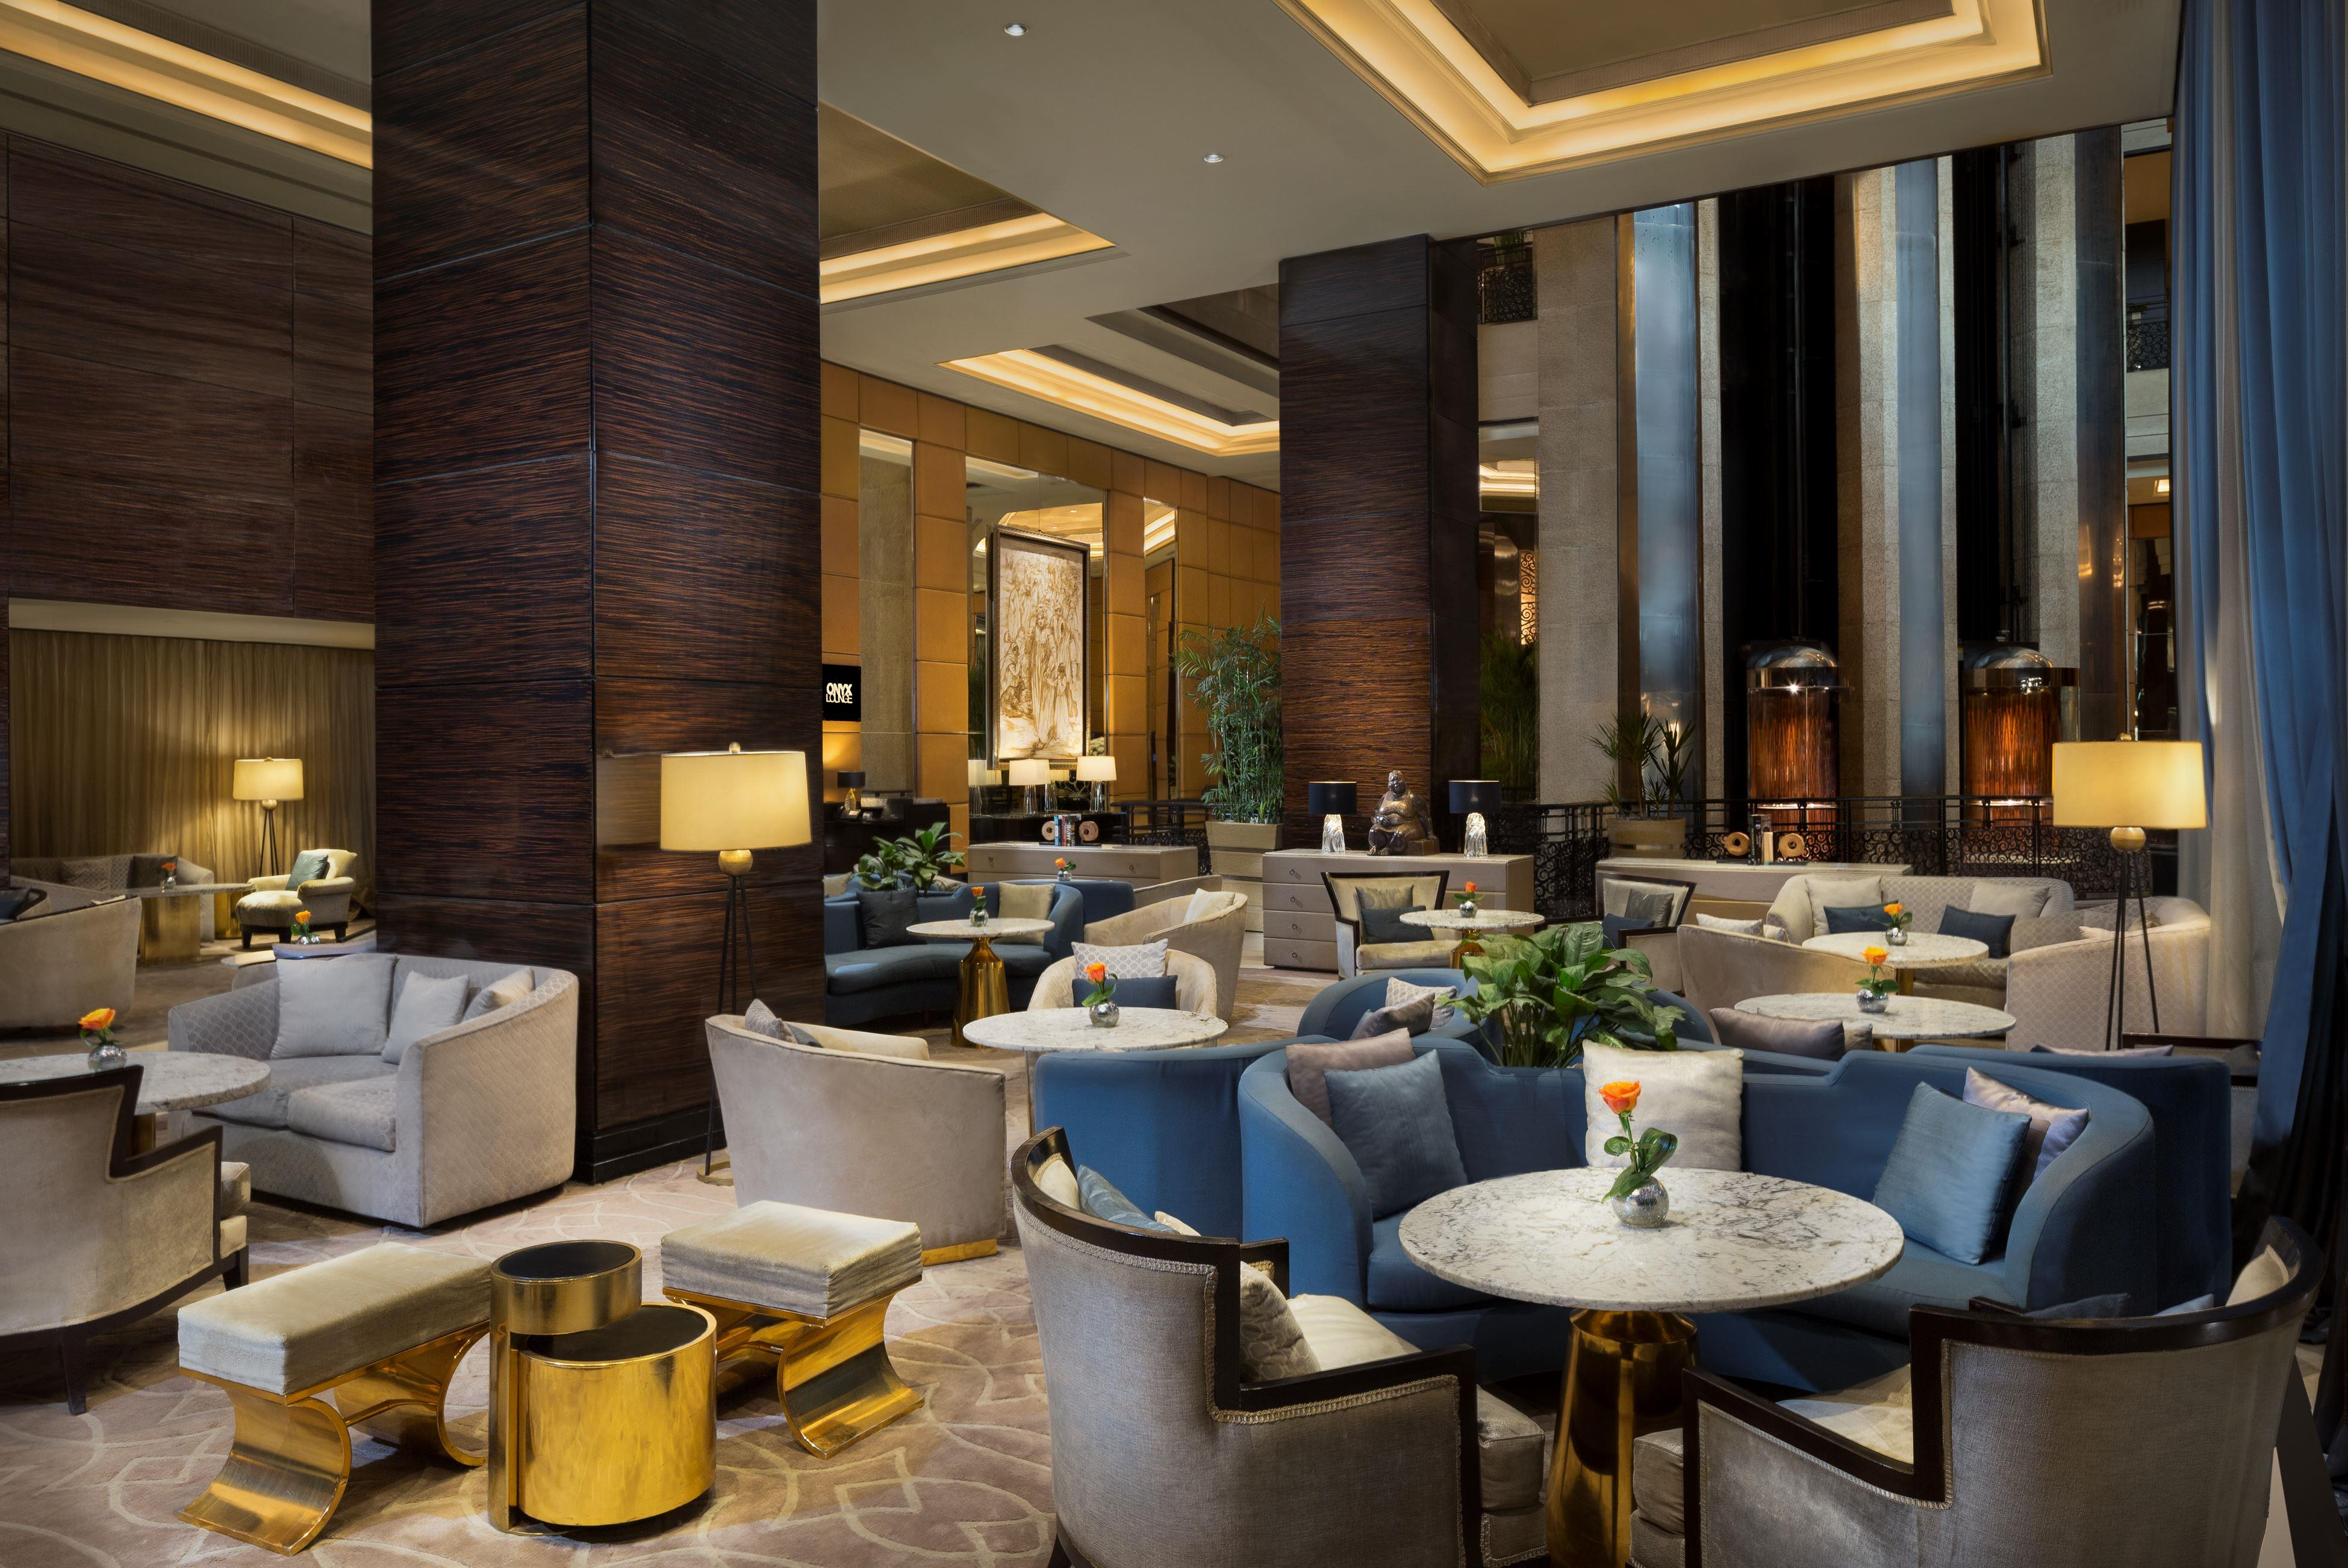 onyx lounge fairmont nile city fairmont luxury hotels resorts onyx lounge fairmont nile city